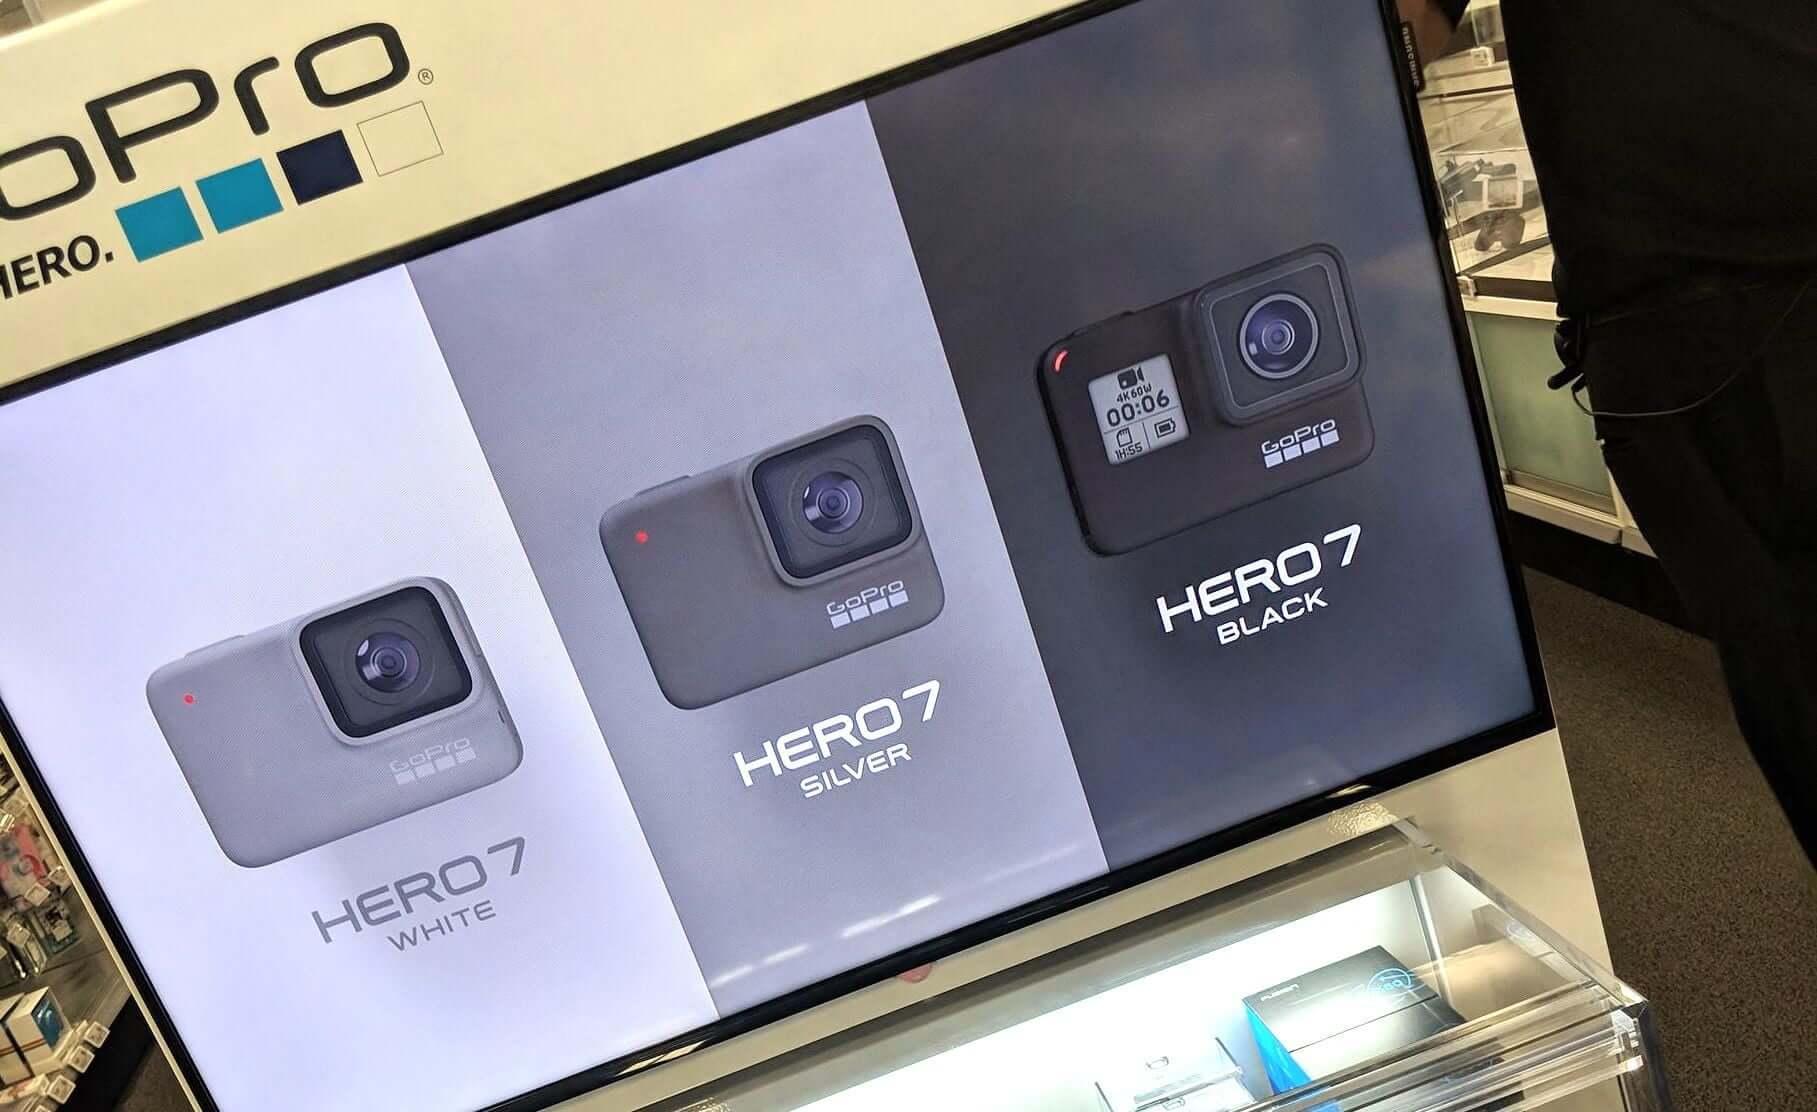 A nova Hero 7 aparece nas cores cinza, branco e preto